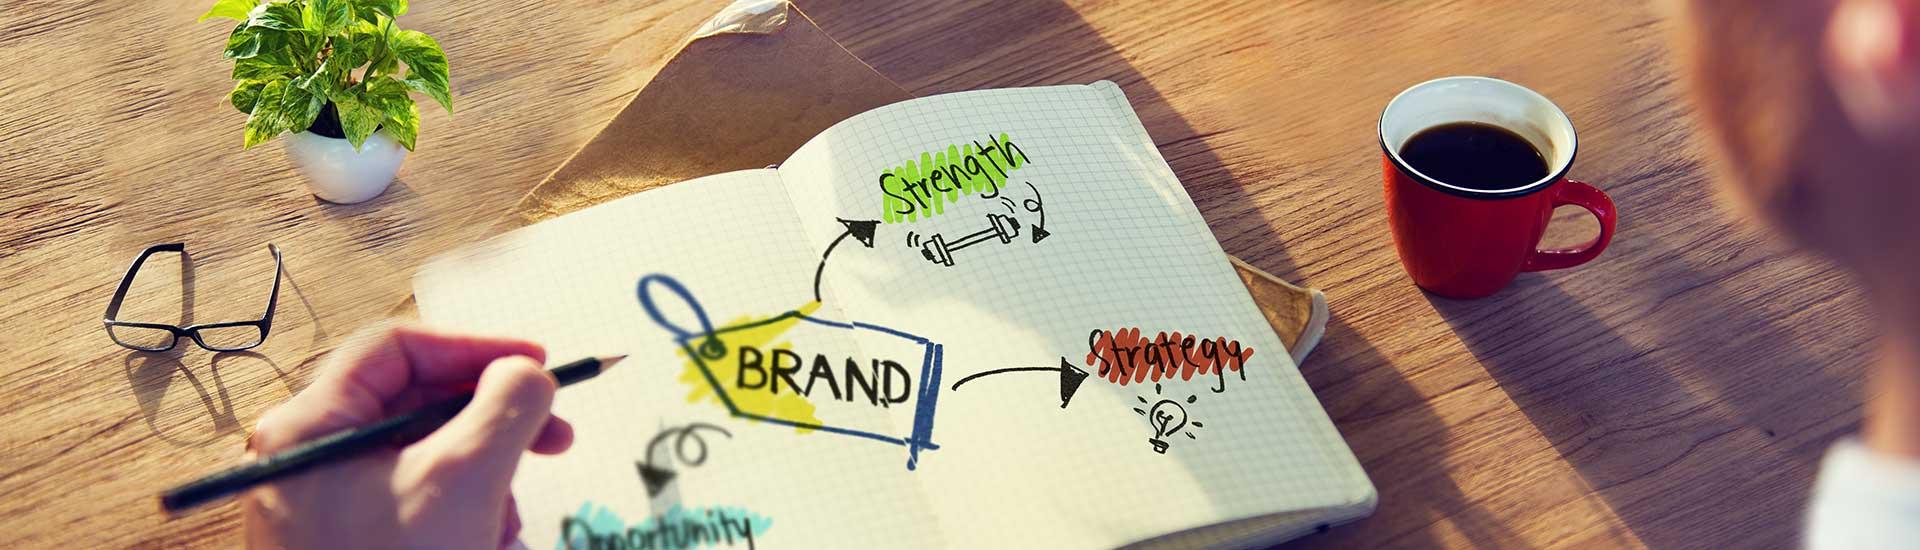 brand-management Image